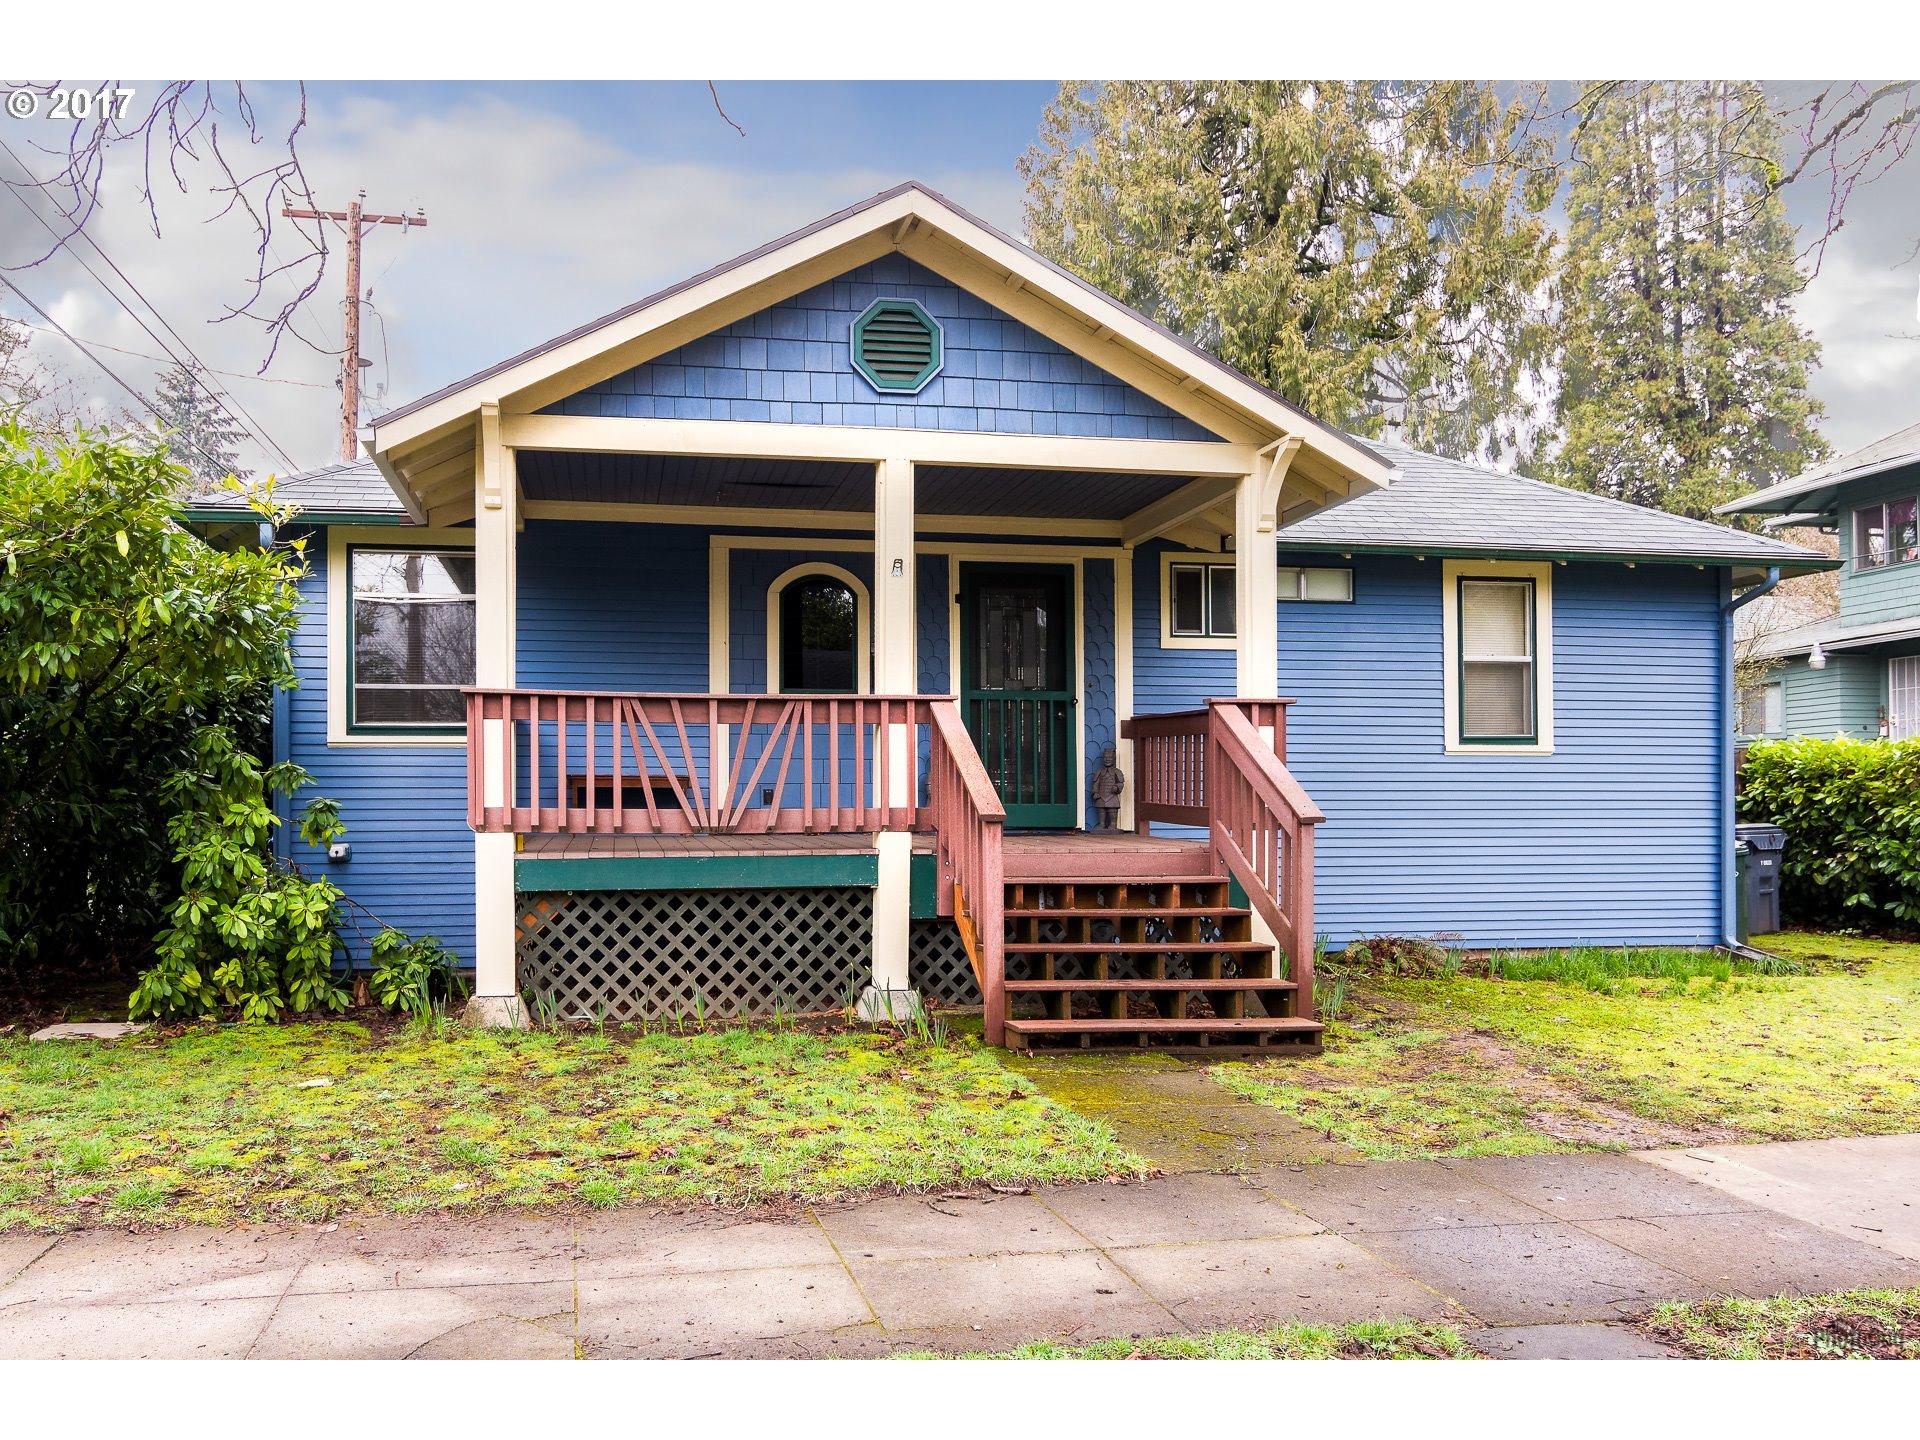 1040 JEFFERSON ST, Eugene, OR 97402